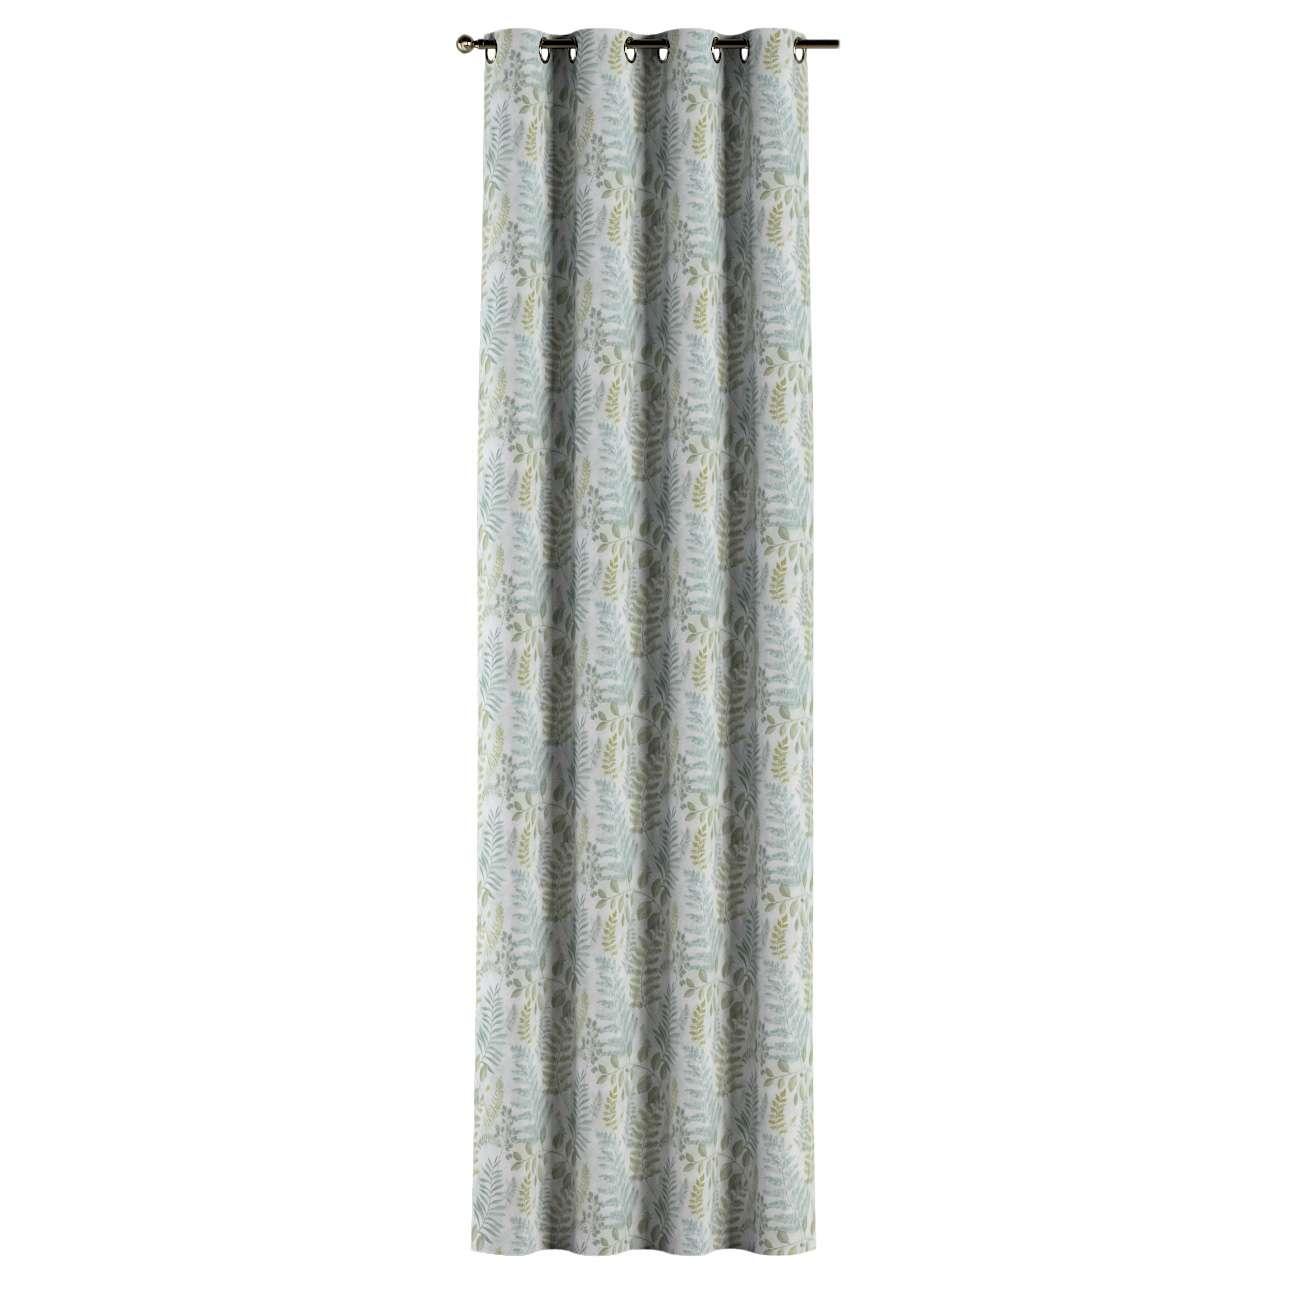 Gardin med øskner 1 stk. fra kollektionen Pastel Forest, Stof: 142-46